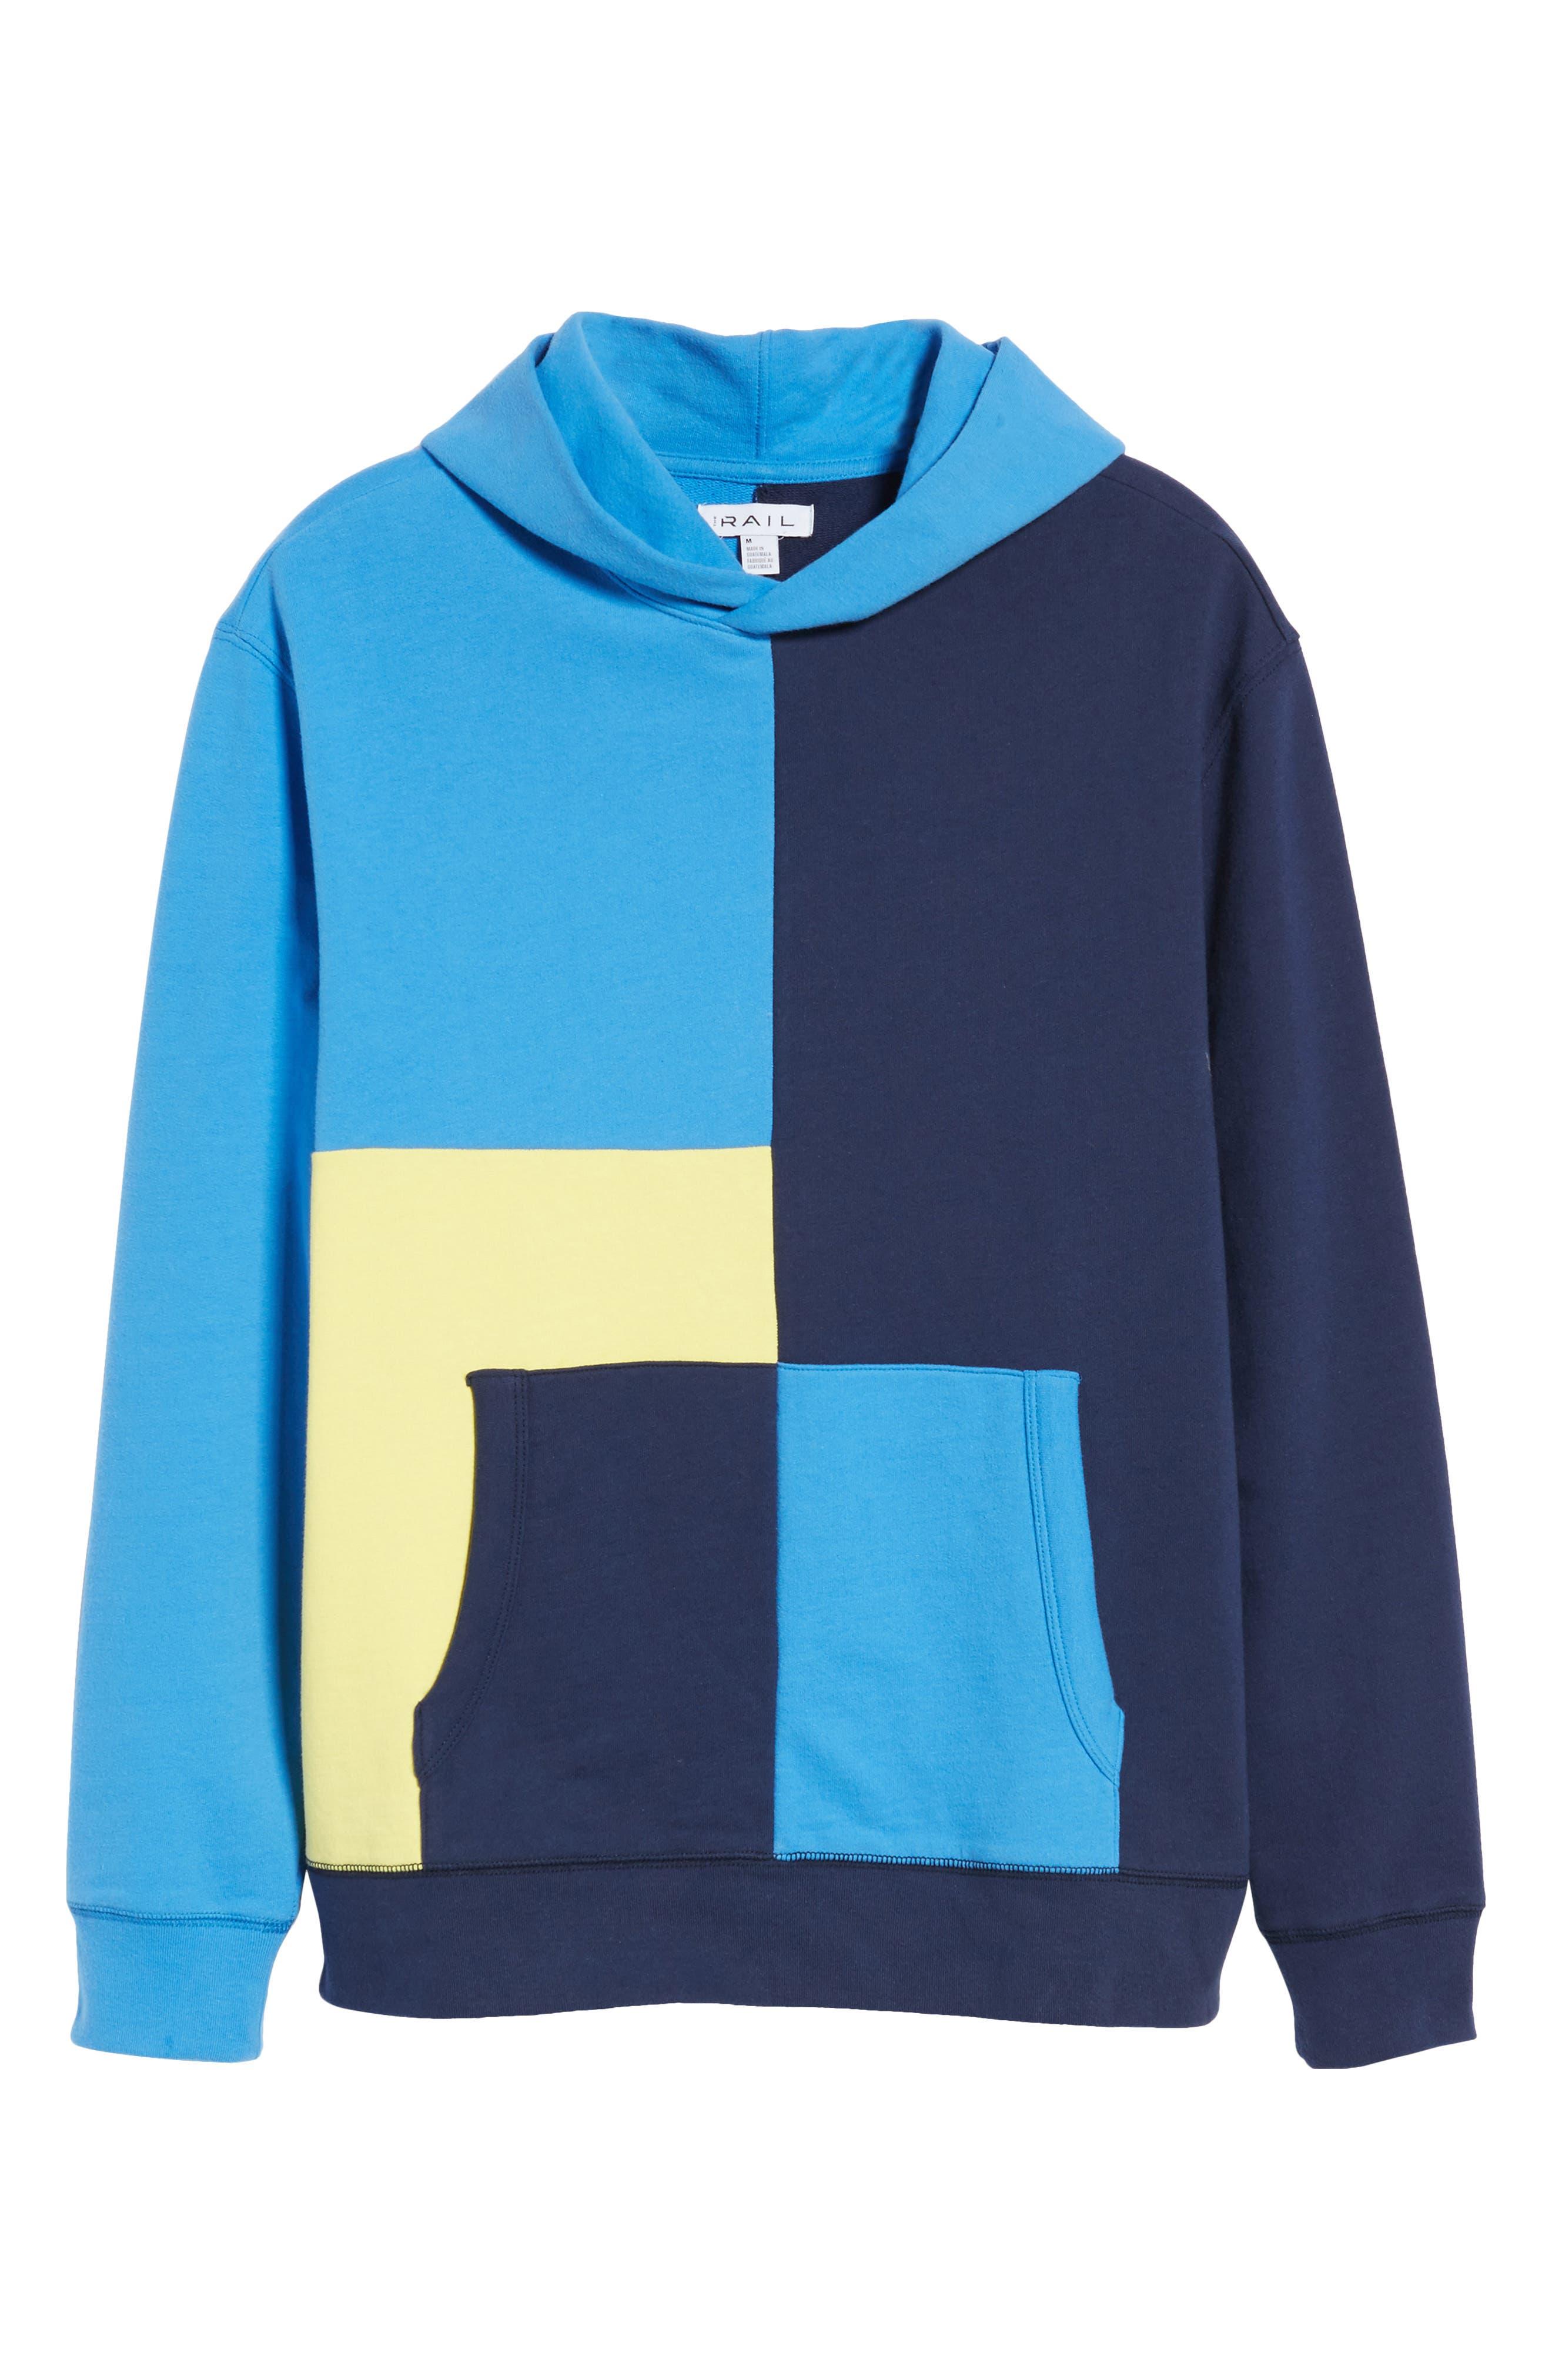 Colorblock Hoodie Sweatshirt,                             Alternate thumbnail 6, color,                             Navy Blue Yellow Block